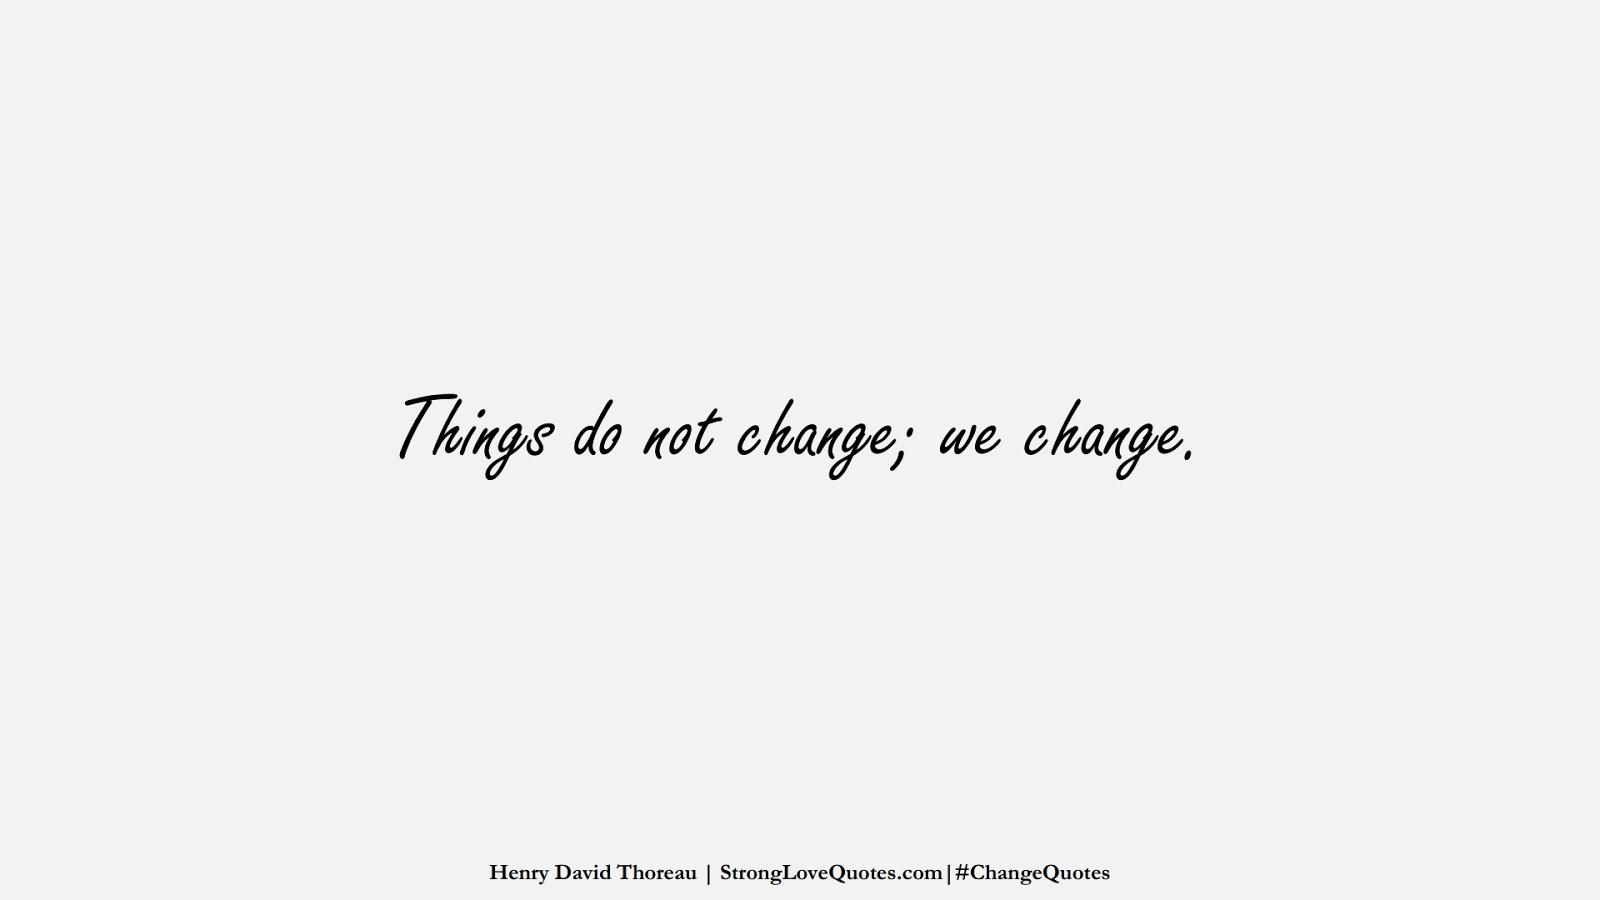 Things do not change; we change. (Henry David Thoreau);  #ChangeQuotes